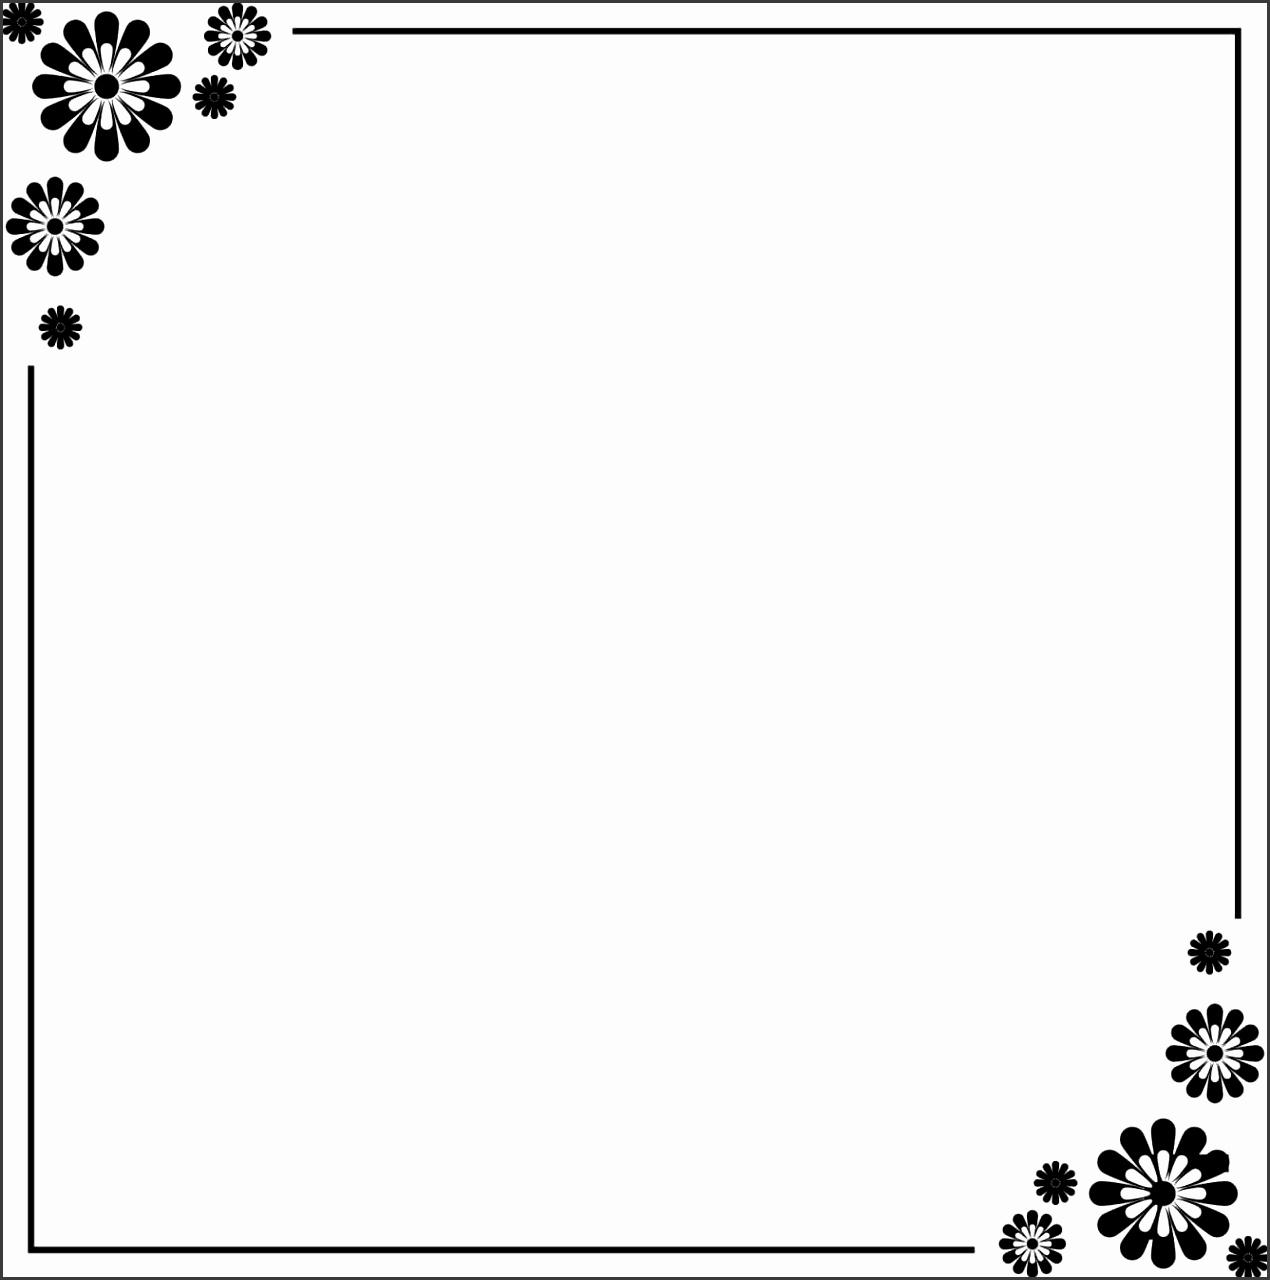 Free Printable Page Borders Designs